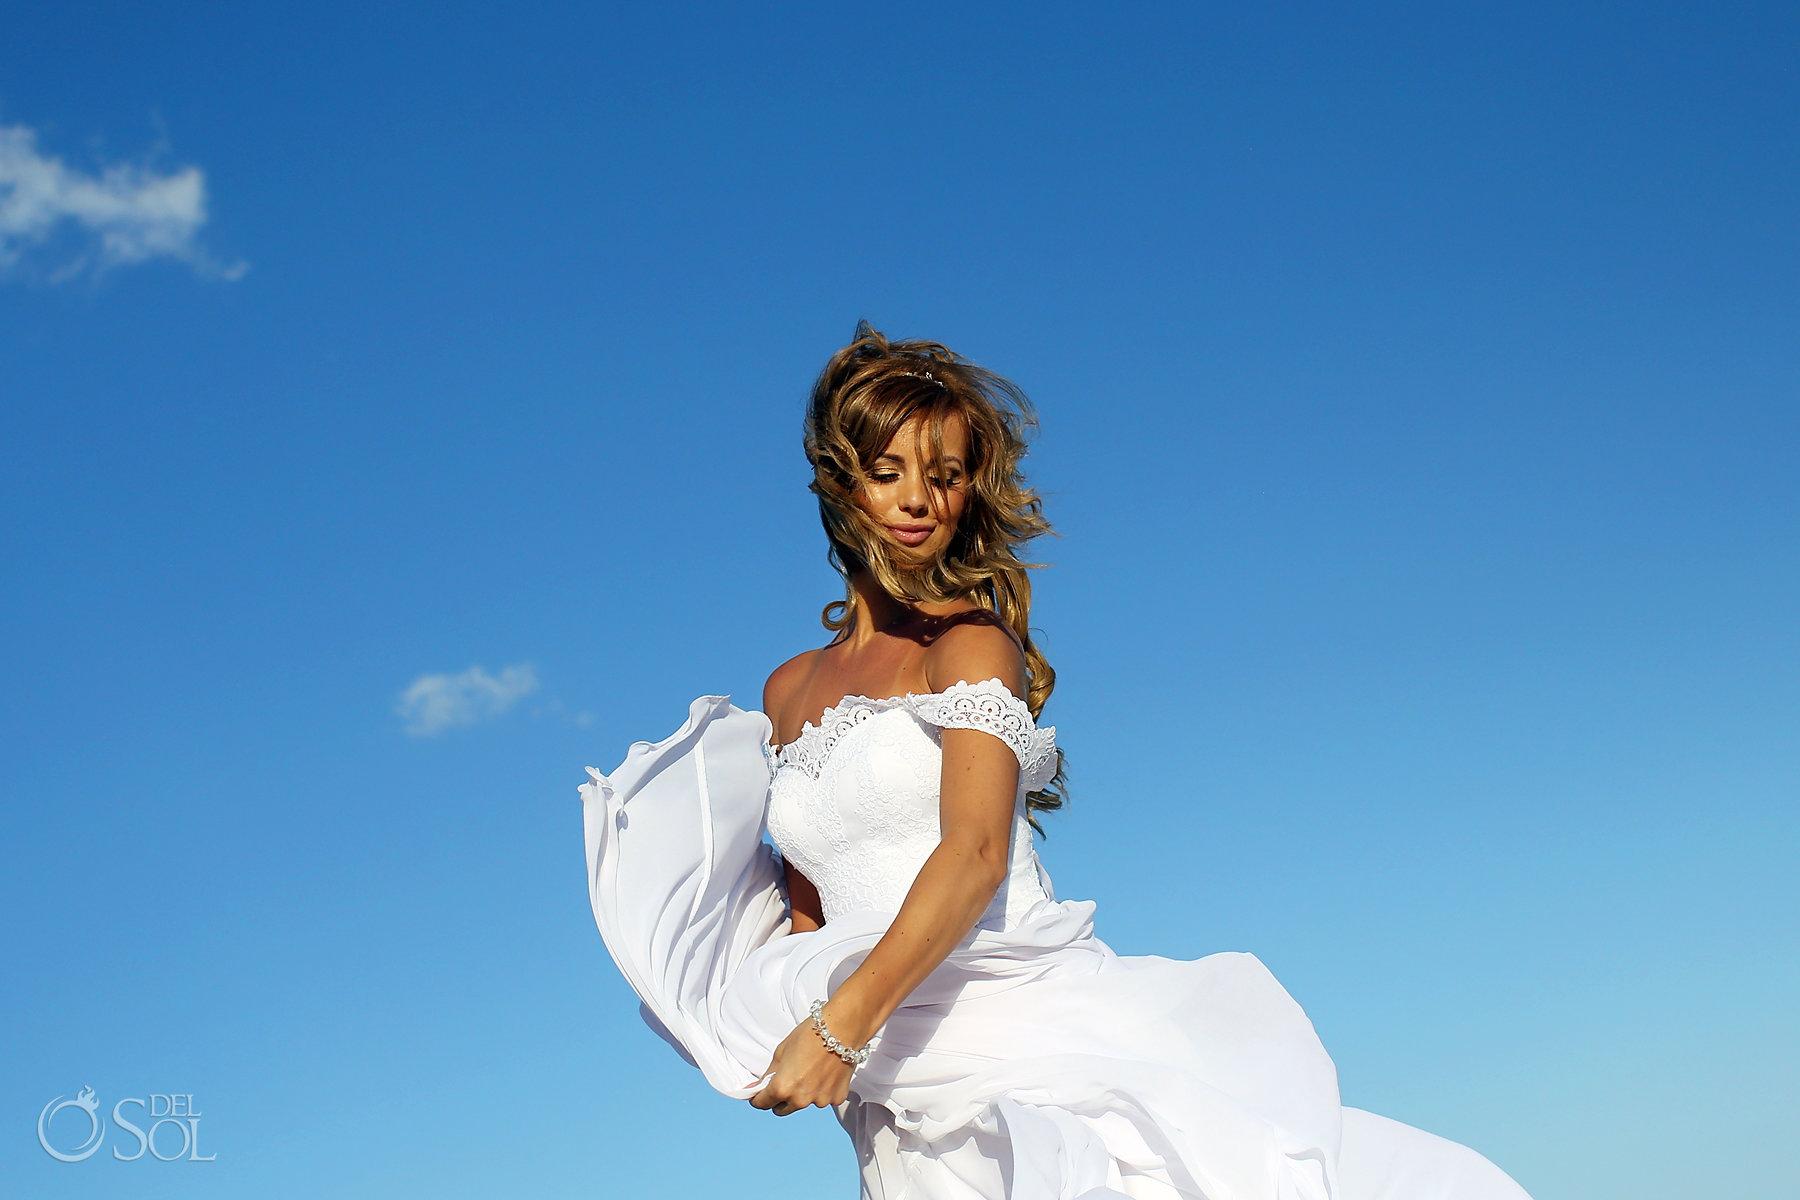 Softh light with bridal dress long bridal hair dress